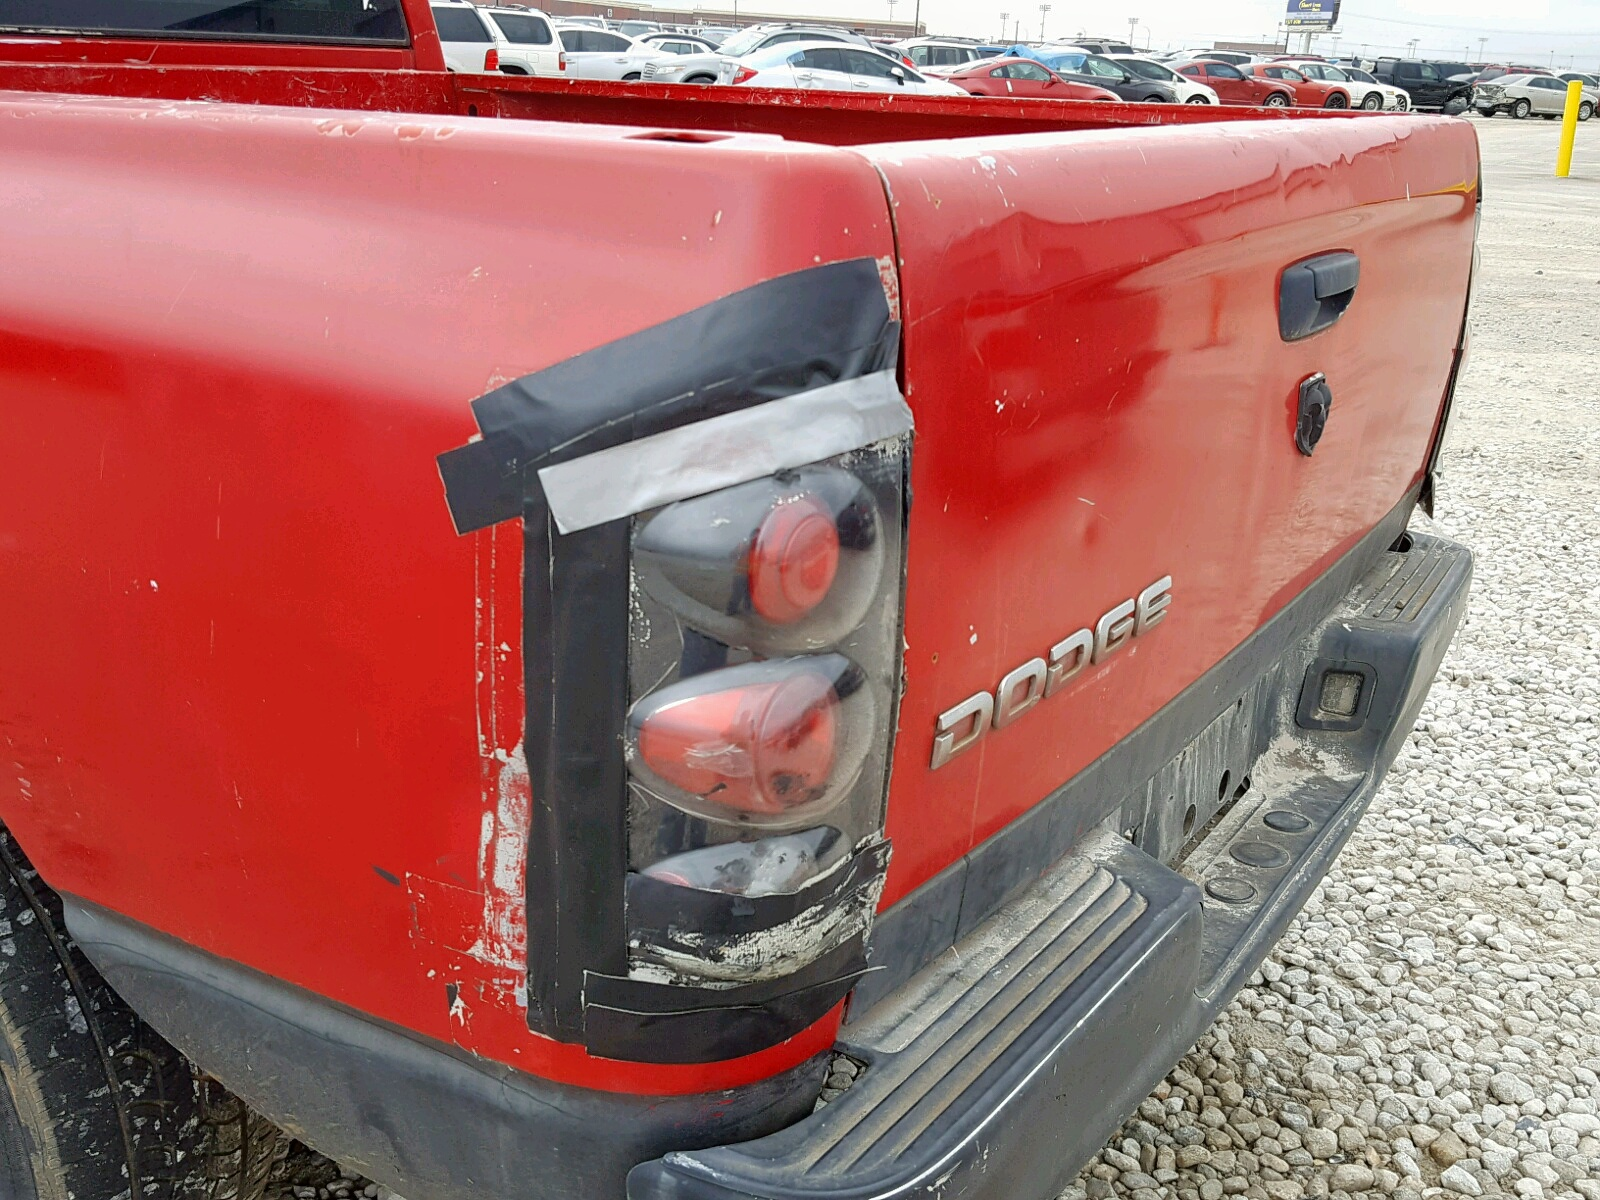 1D7HA18N64J135754 - 2004 Dodge Ram 1500 S 4.7L